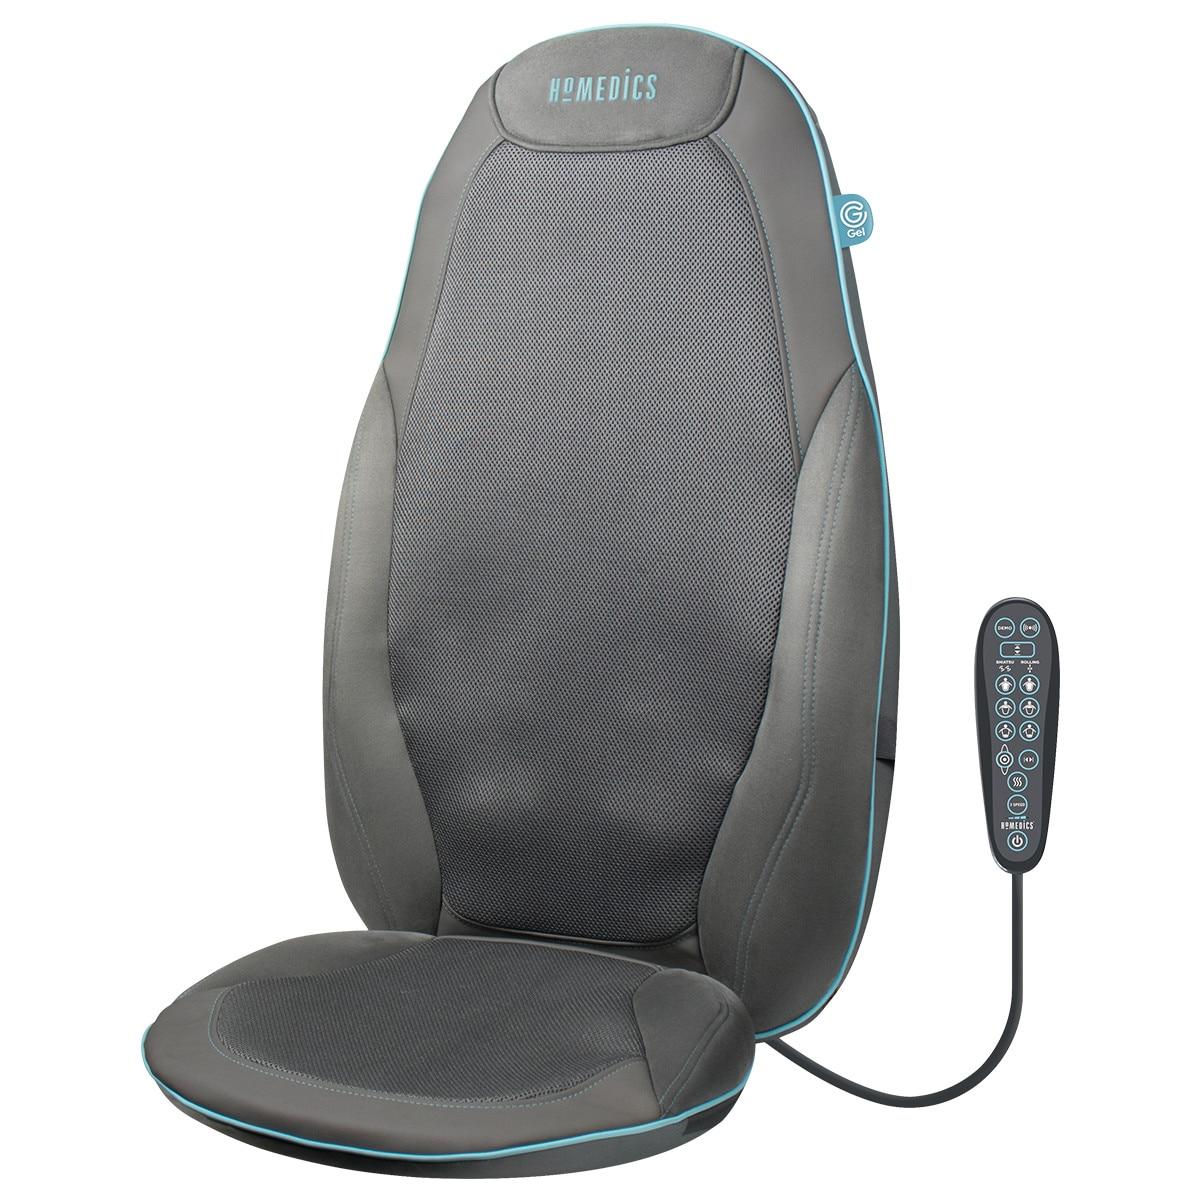 Fotografie Husa de scaun pentru masaj shiatsu cu gel, SGM-1300H-EU, HoMedics, 6 programe presetate, telecomanda, functie demo, Gri